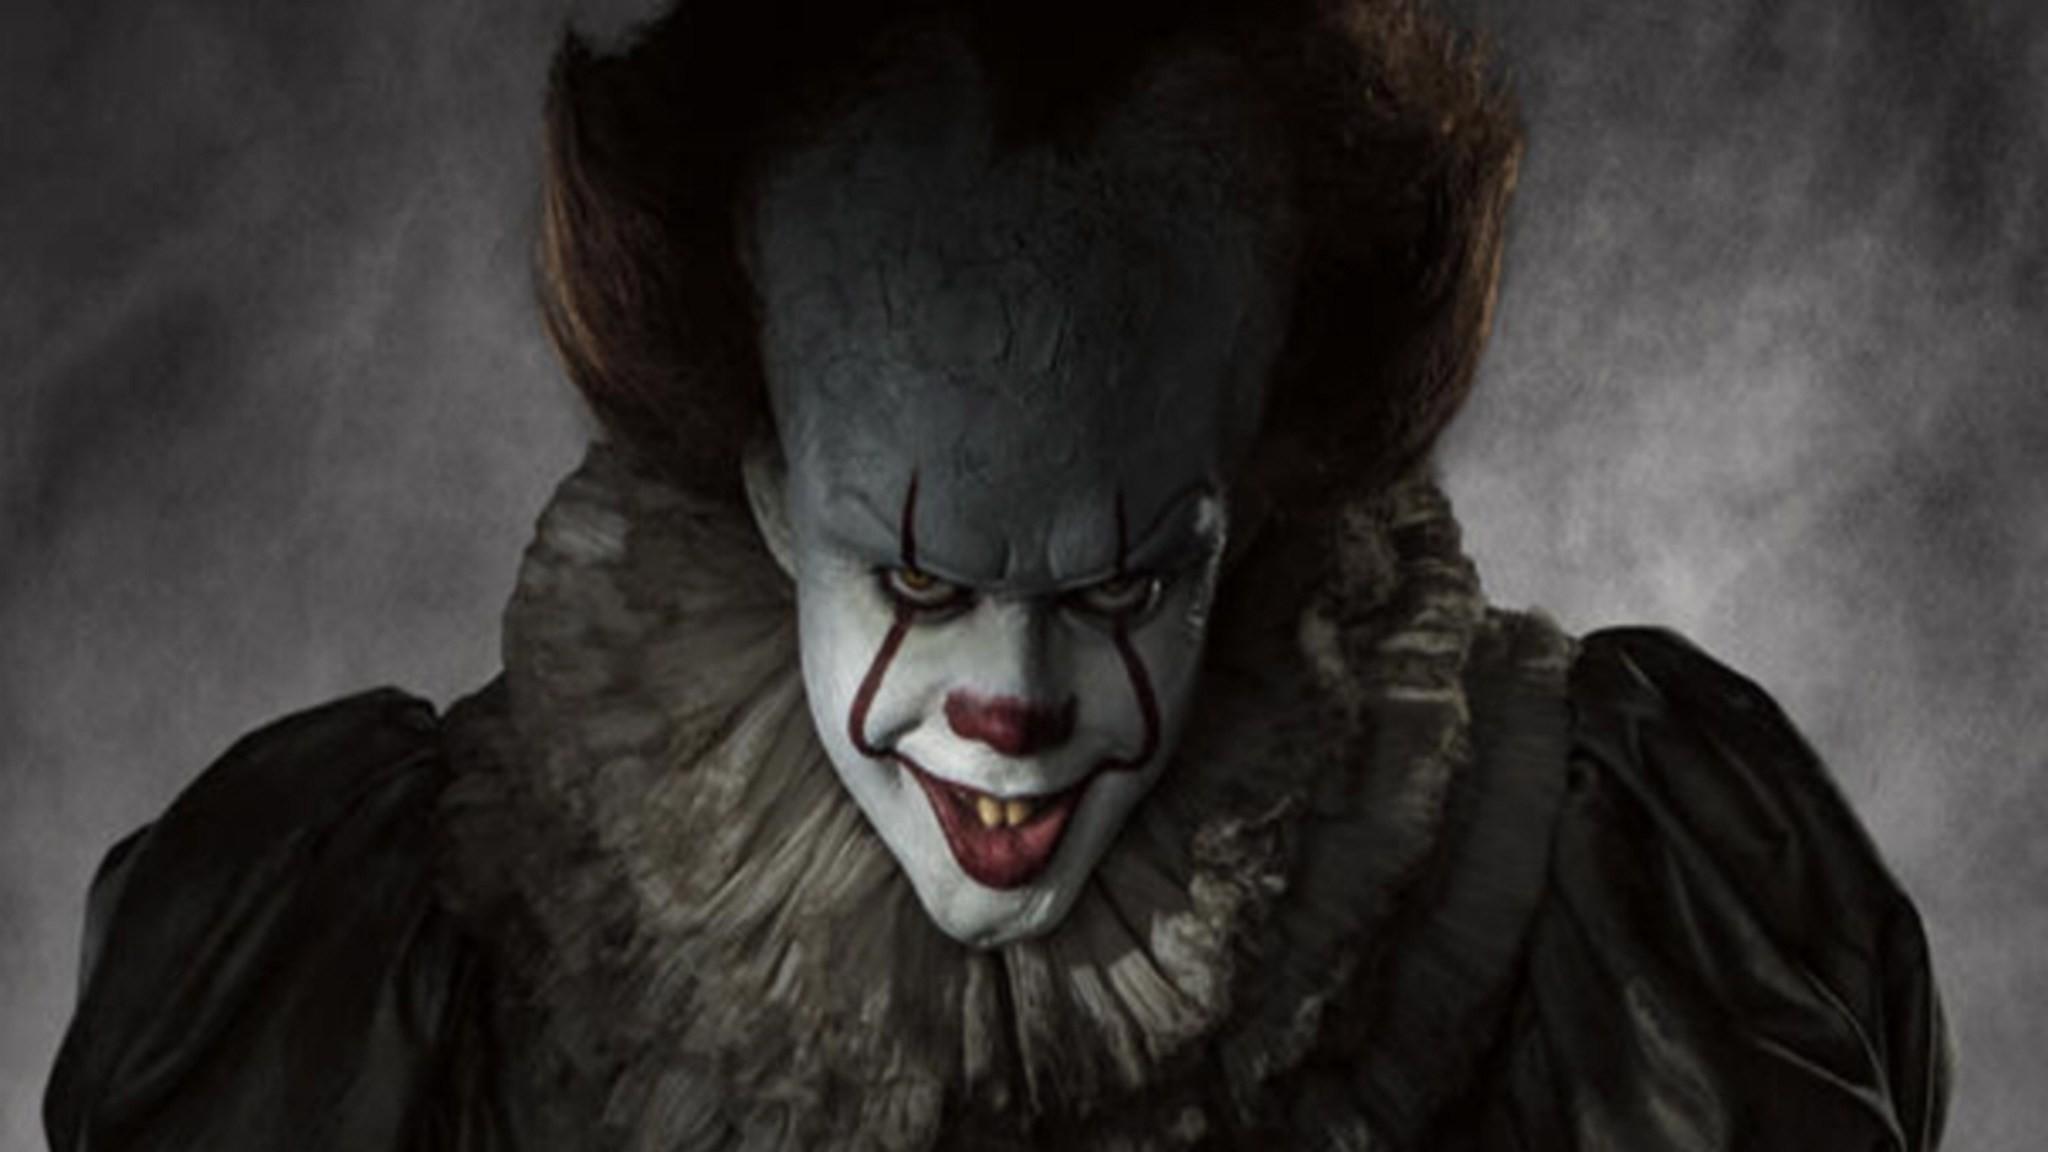 Stephen King's 'It' Teaser Trailer And Scene Description Released – The Drop